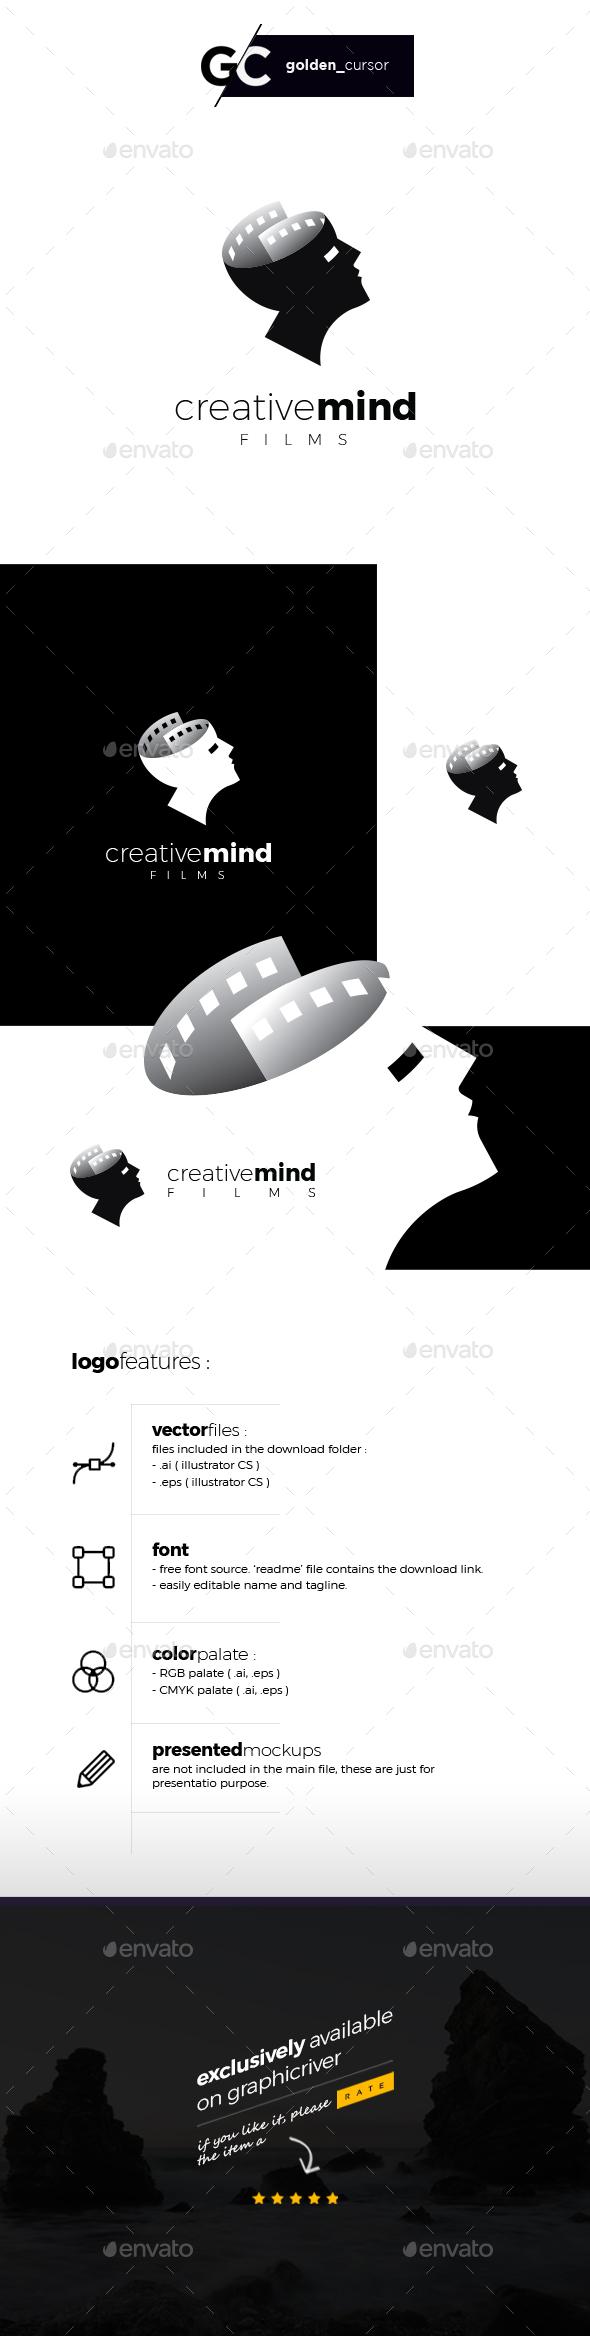 Creative mind films logo template